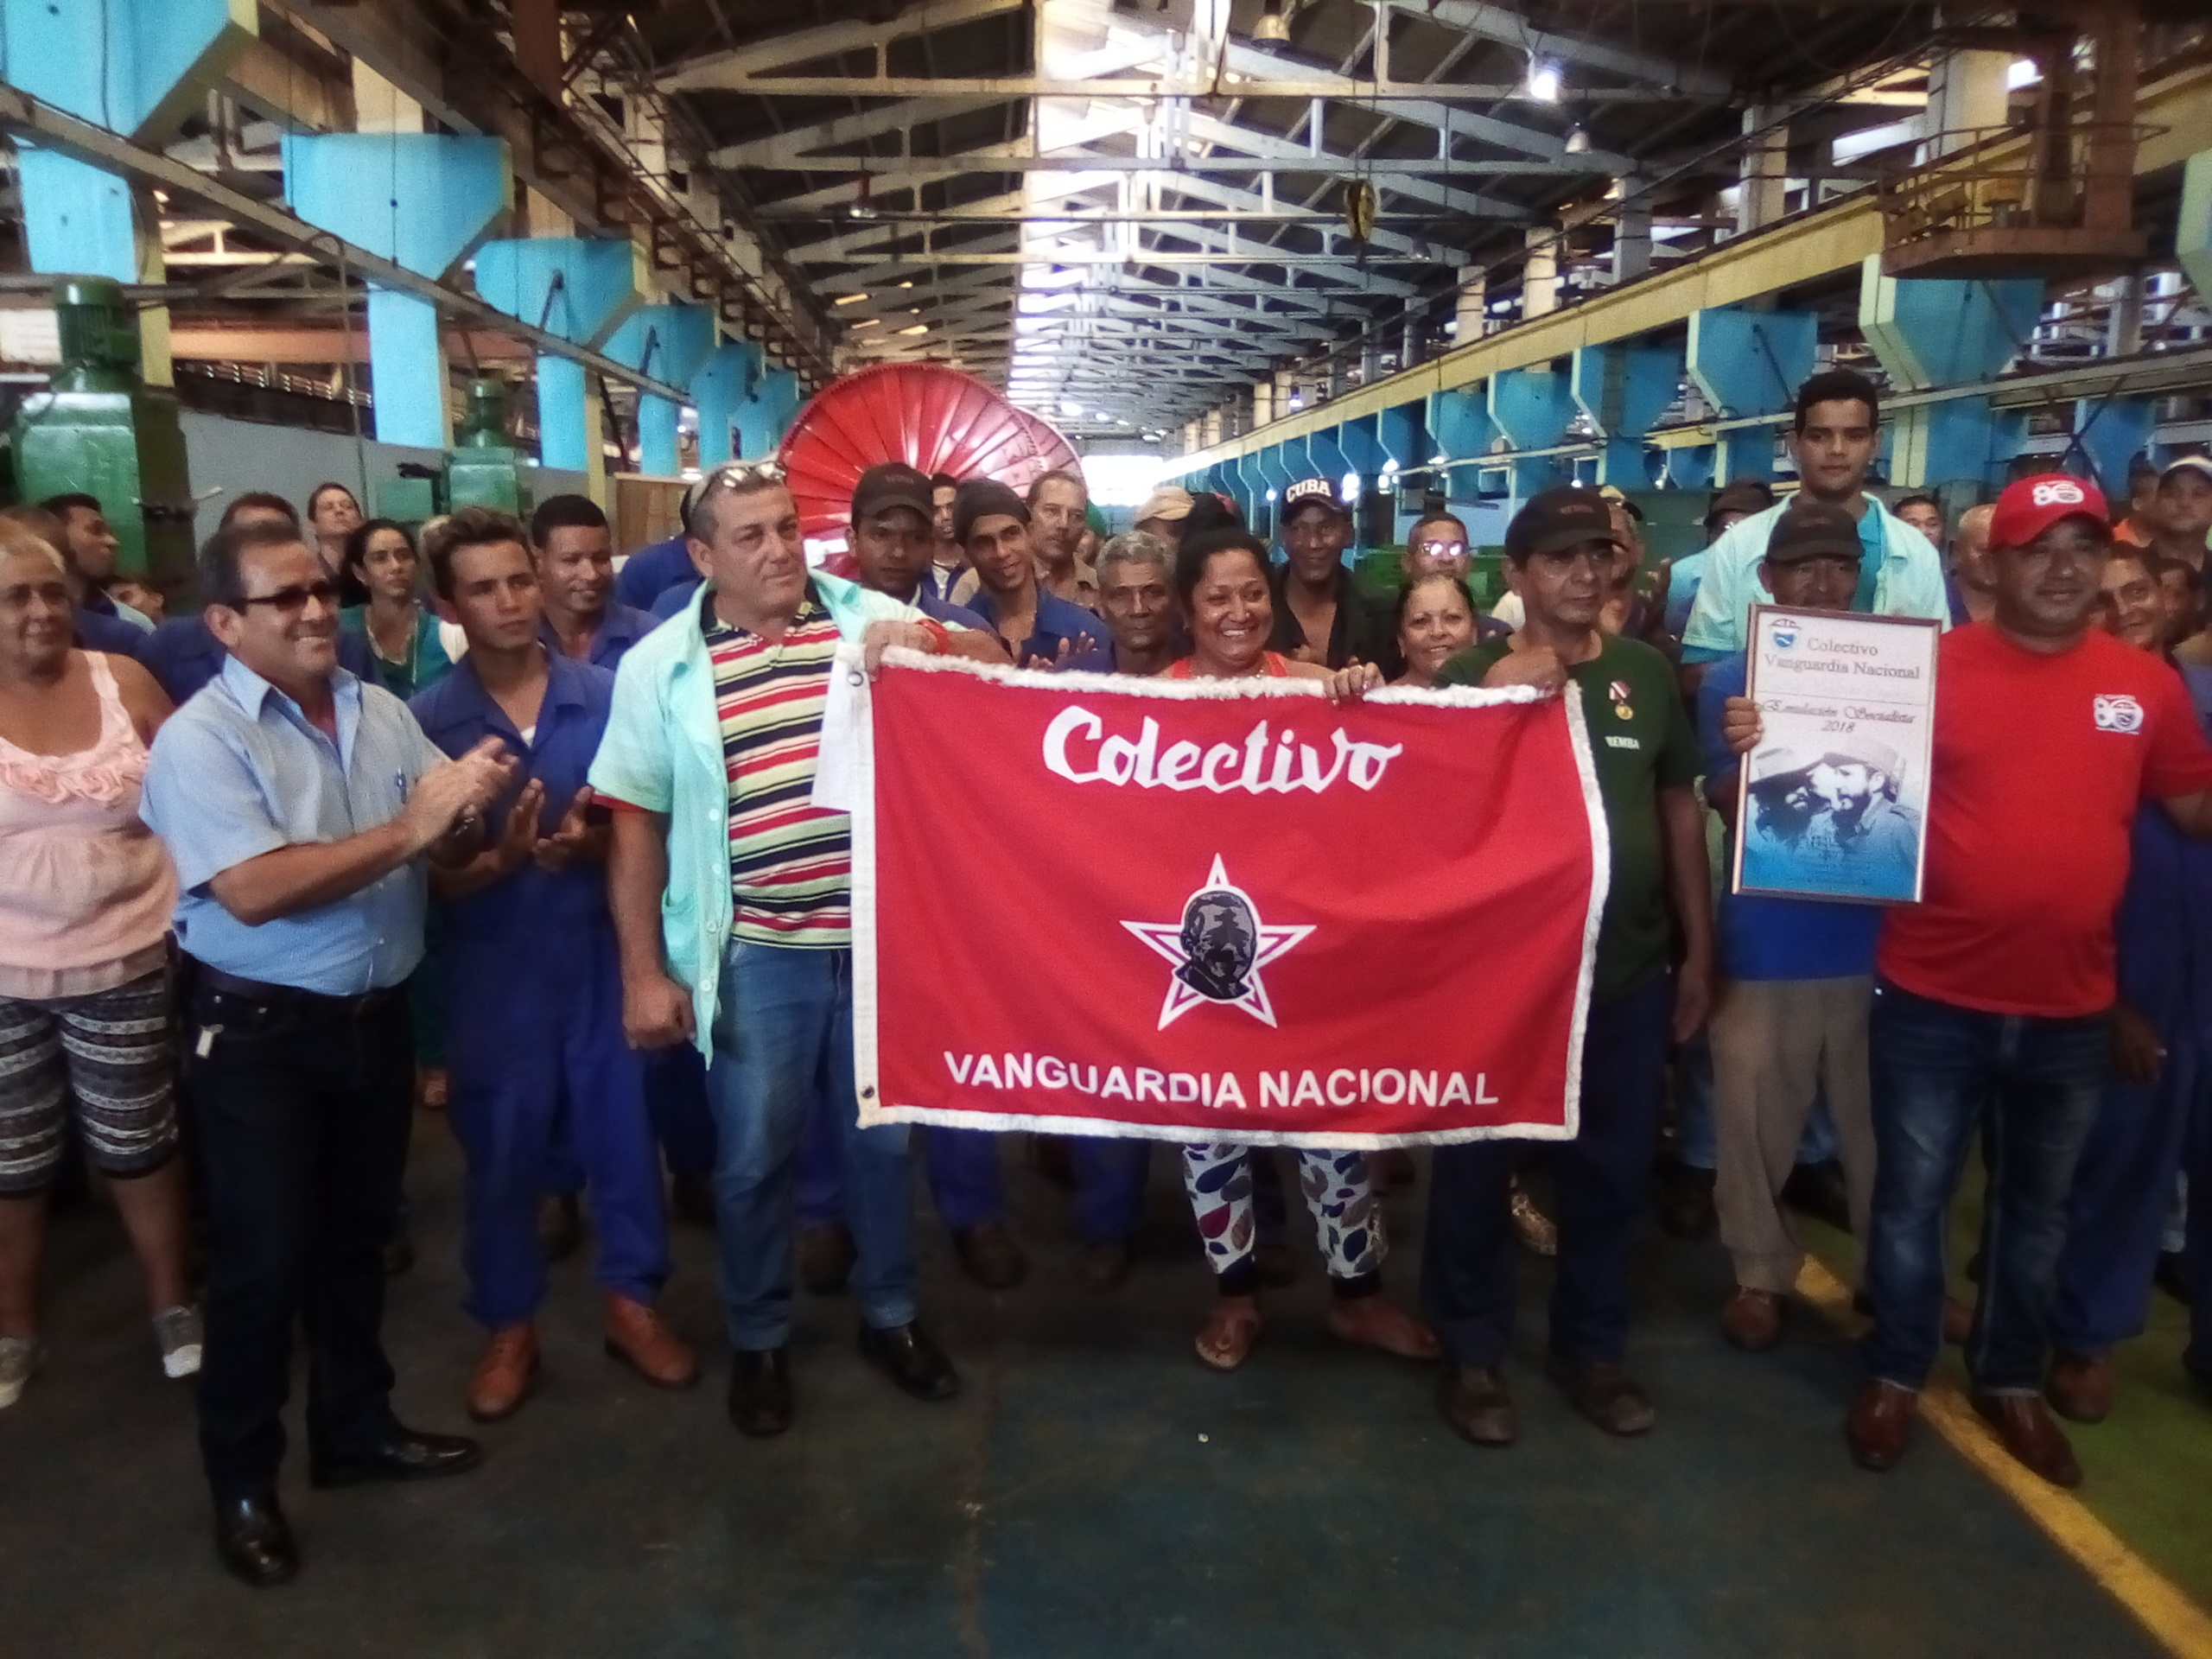 Recibe Fábrica Mecánica de Bayamo reconocimiento Vanguardia Nacional